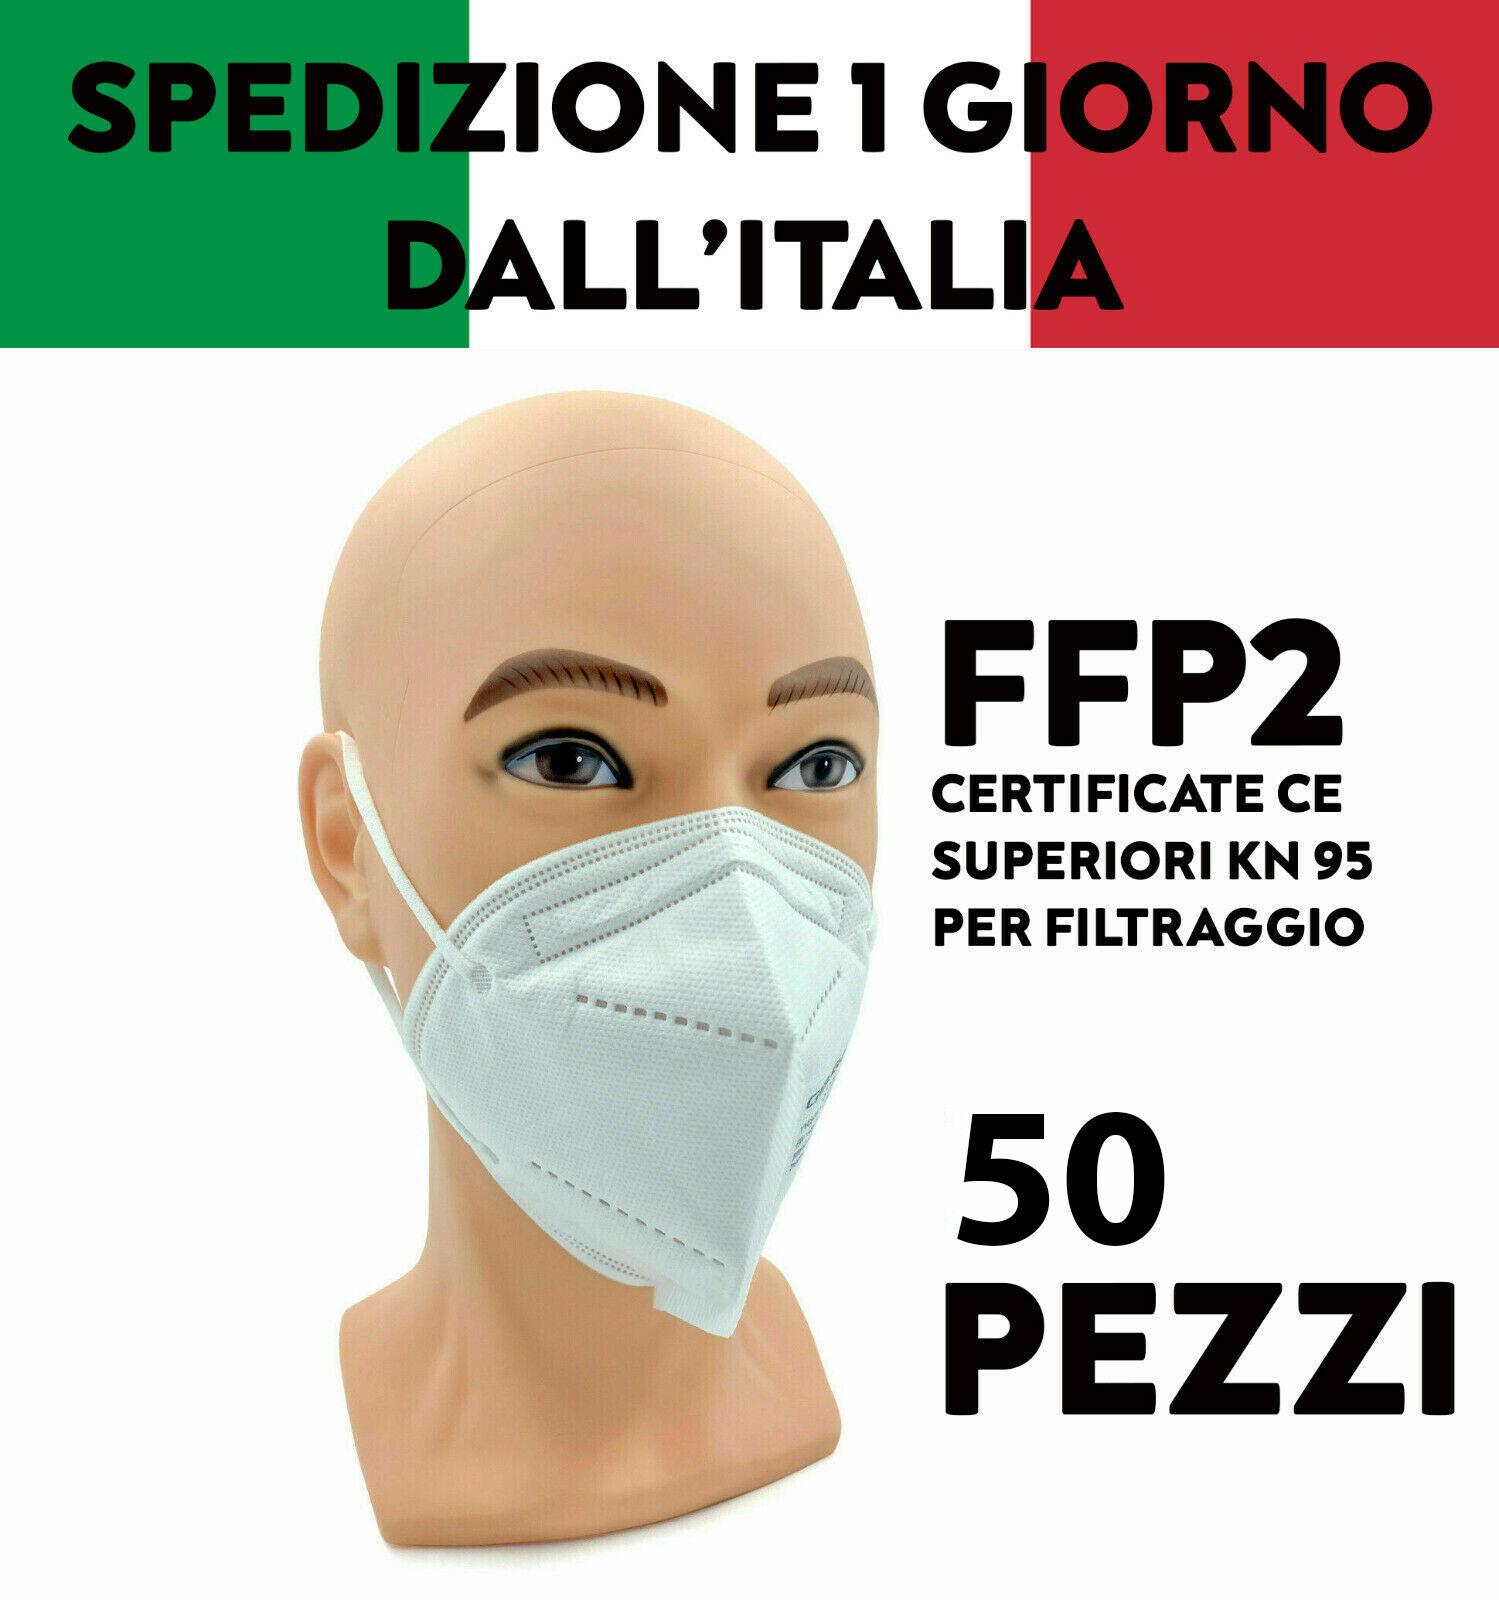 50X MASCHERINE PROTETTIVE FFP2 CERTIFICATA CE INAIL SENZA VALVOLA MASCHERINA 216